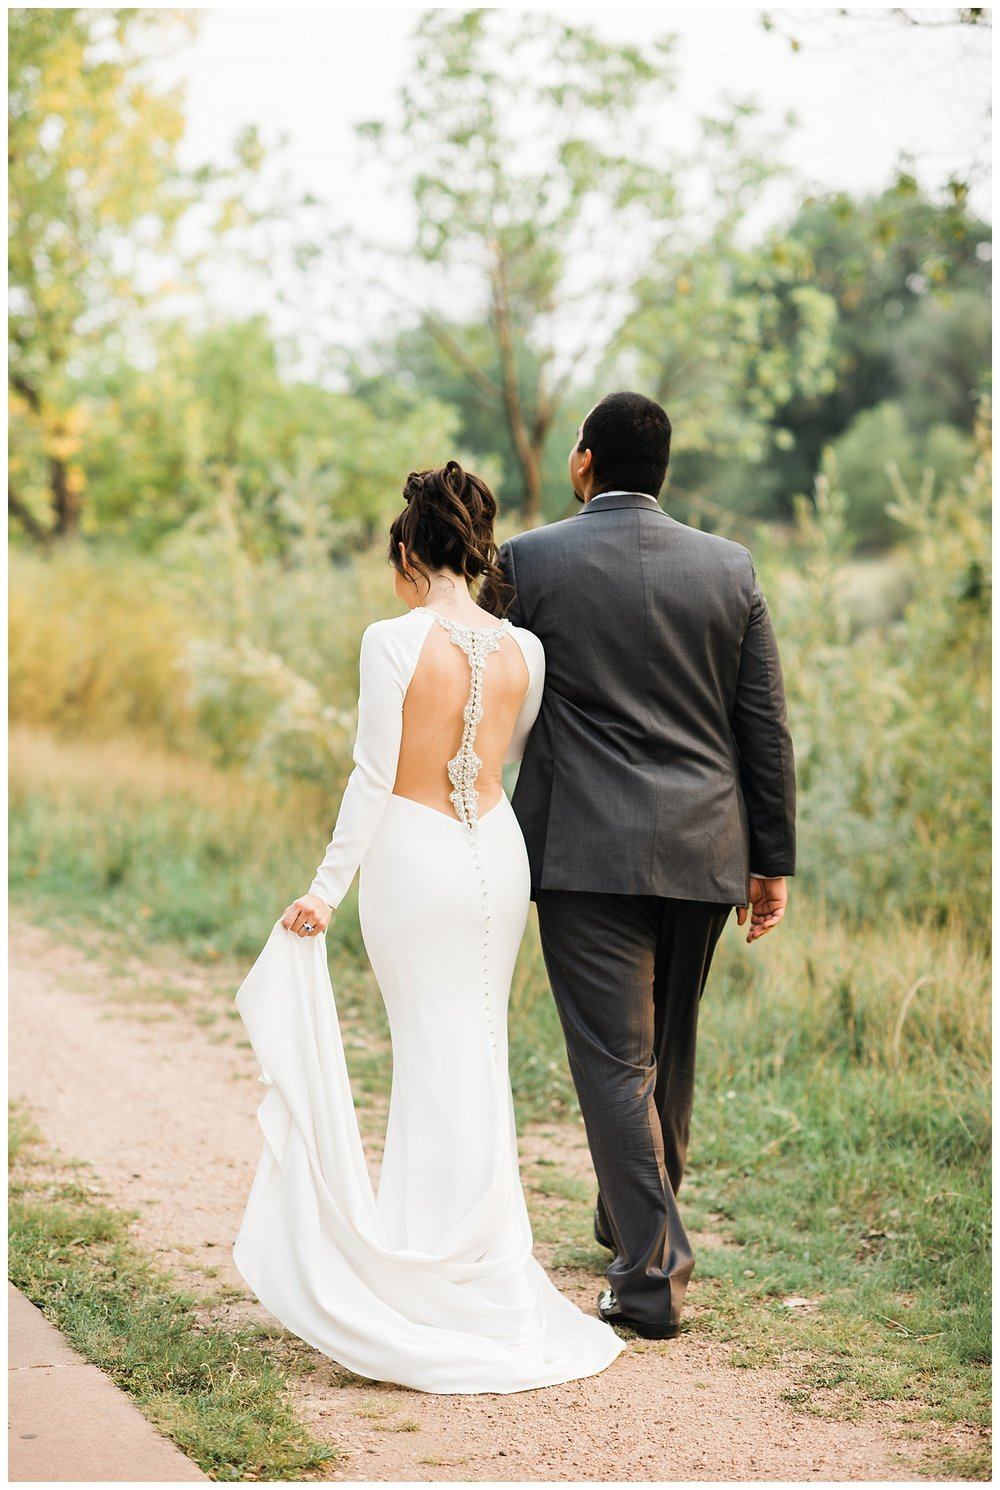 The_Hamptons_Wedding_Photographer_Apollo_Fields_Weddings_Photography_NY_021.jpg